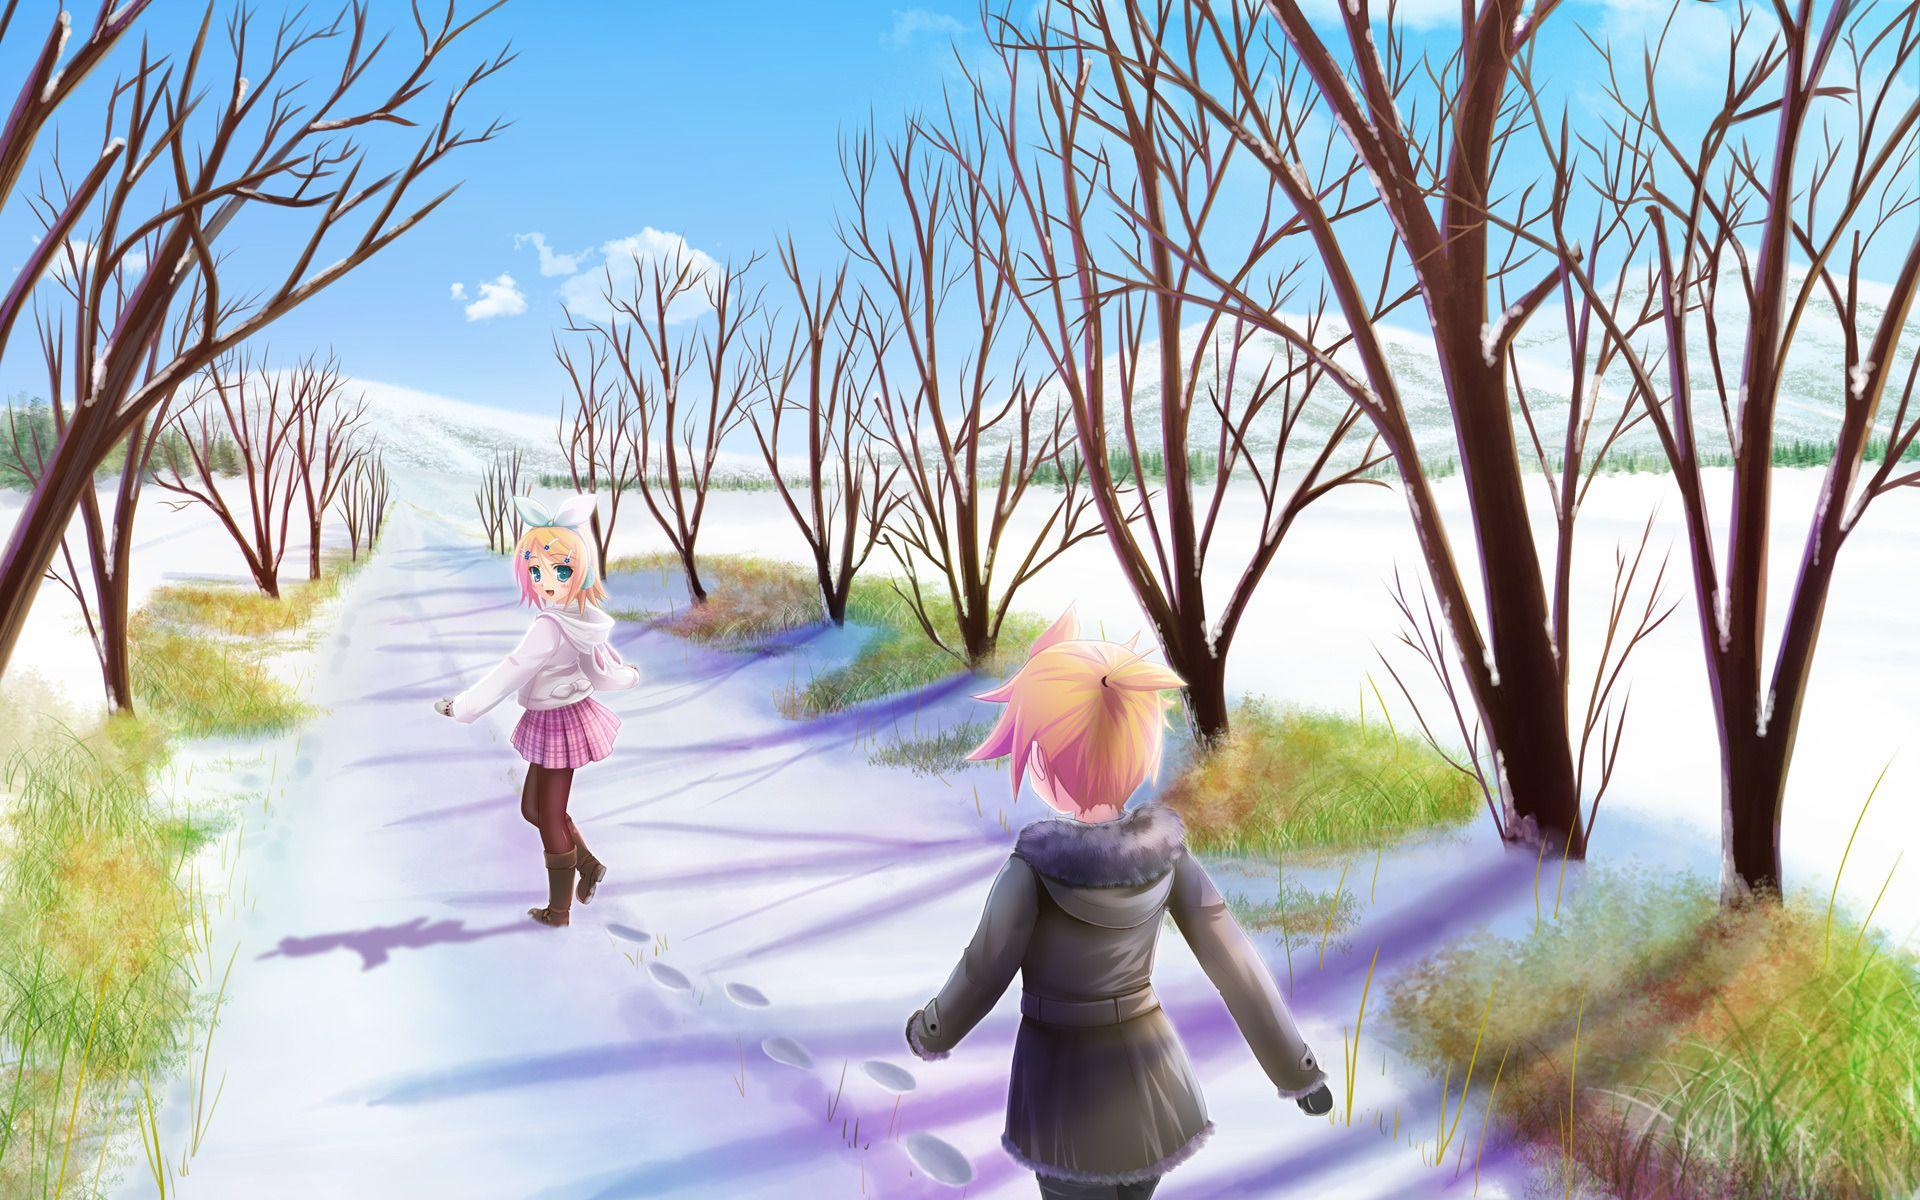 Anime-Winter-Rin-Flax-Vokaloid-Snow-Alley-Mood-jpg-%C3%97-wallpaper-wp5803513